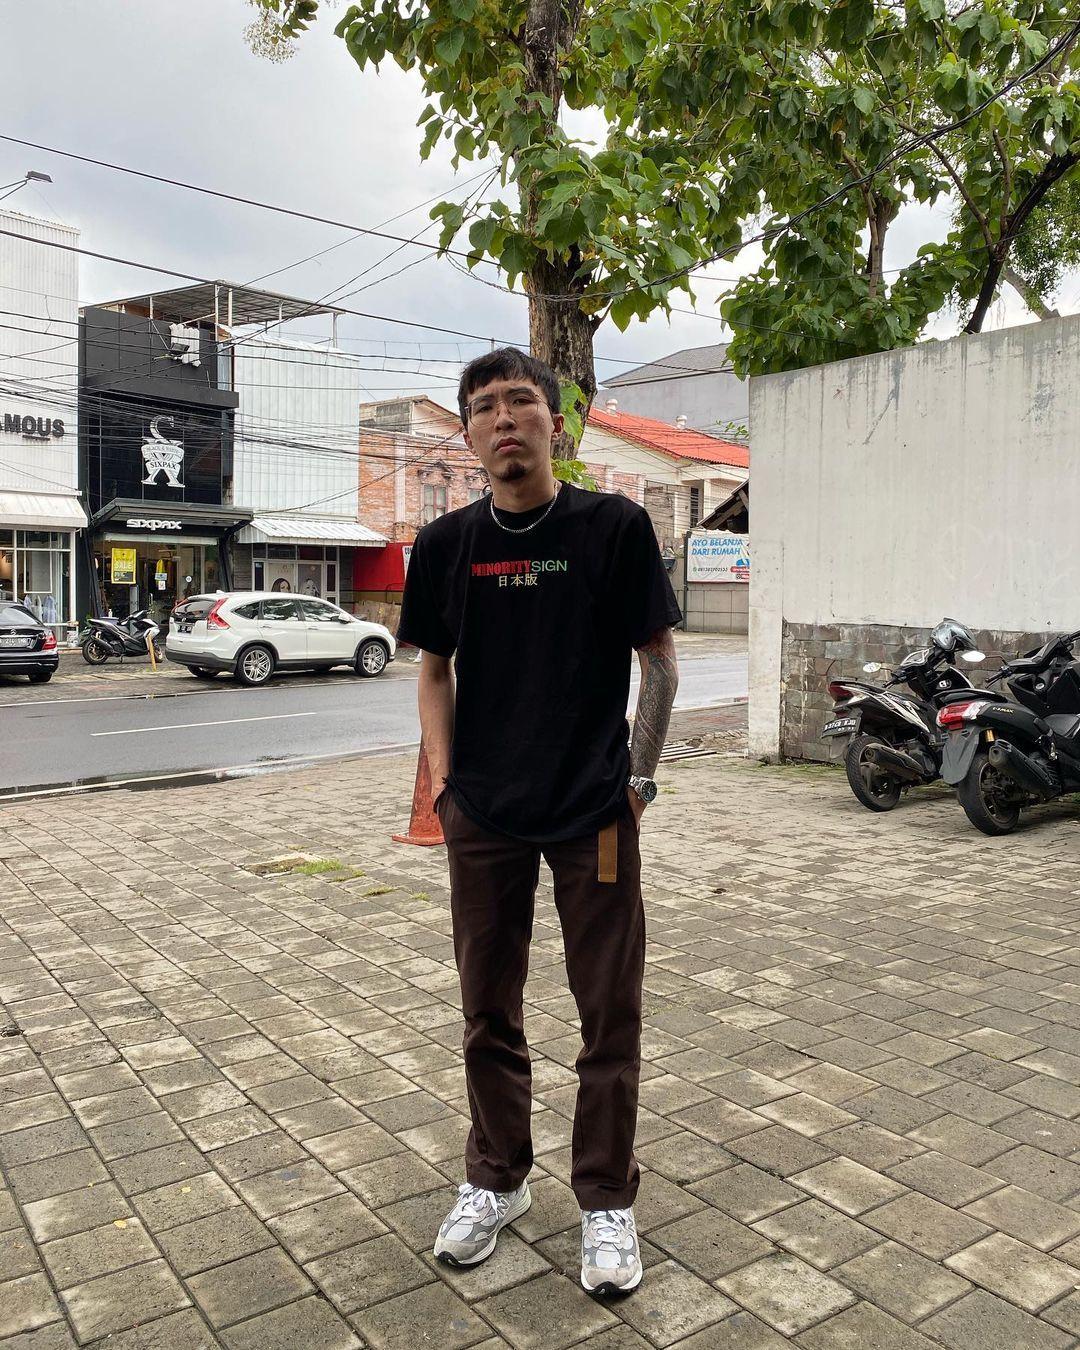 Selain Jokowi, 4 Figur Publik Ini Akan Divaksin di Kloter Pertama